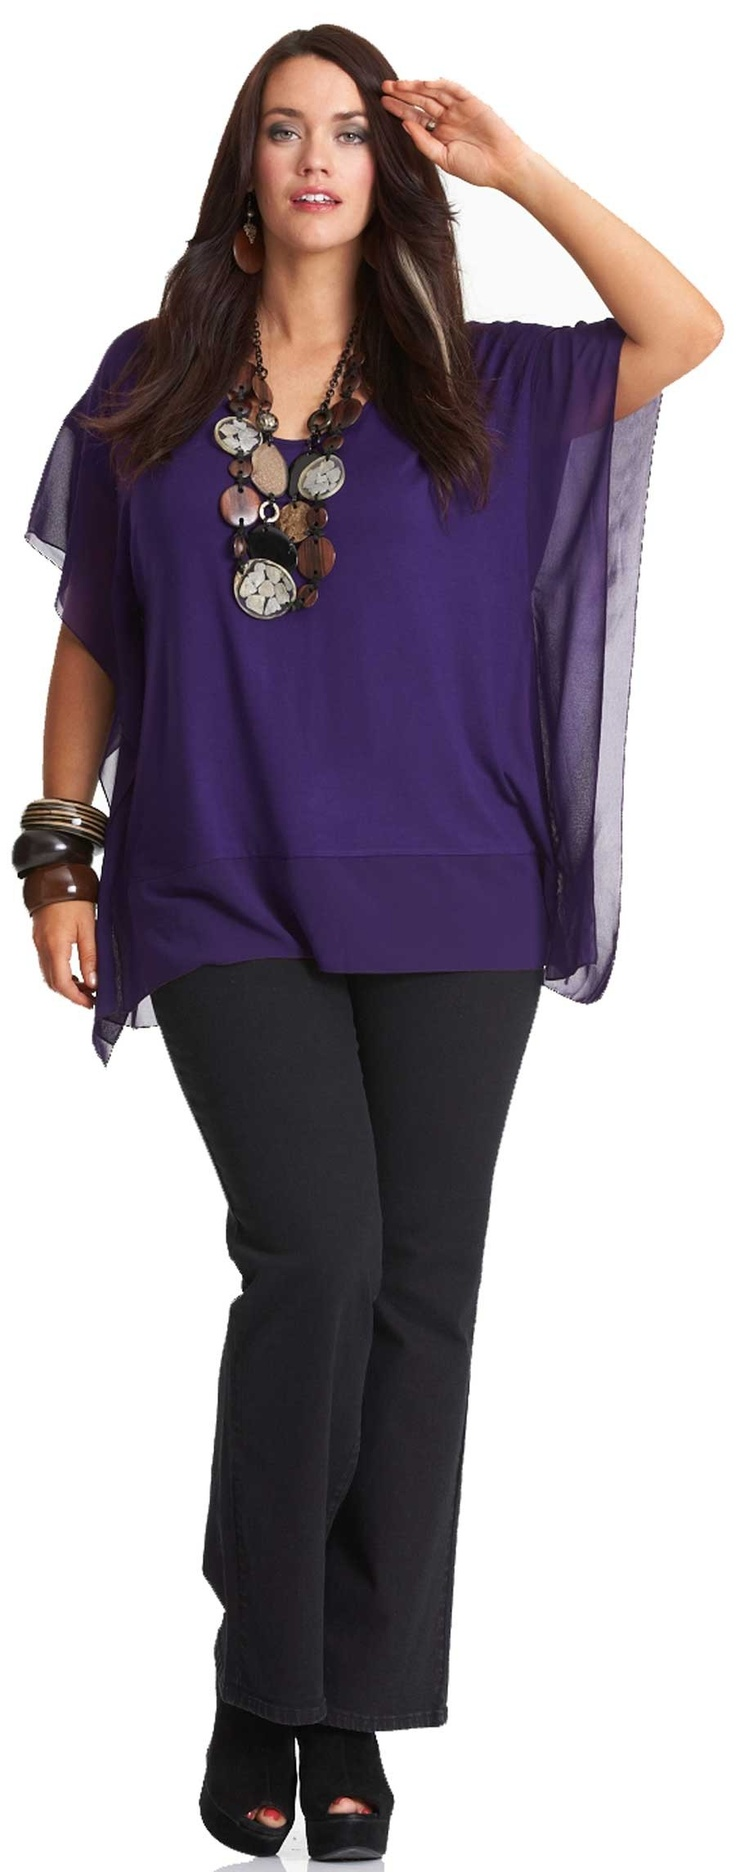 Emme Fijian Square Top - Tops - My Size, Plus Size Women's Fashion & Clothing